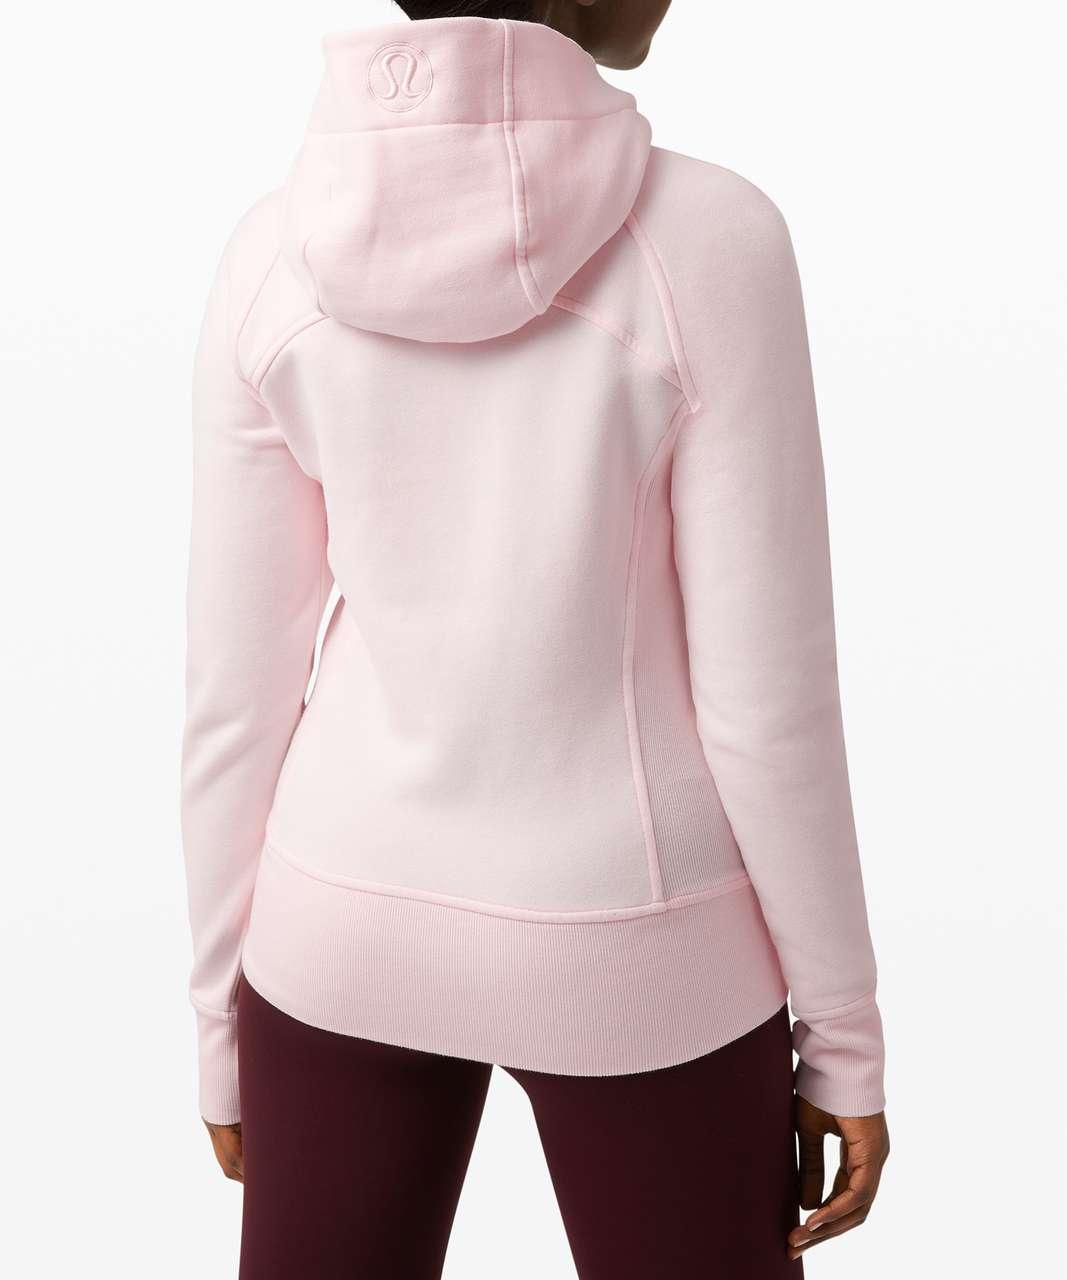 Lululemon Scuba Hoodie *Light Cotton Fleece - Pink Glow